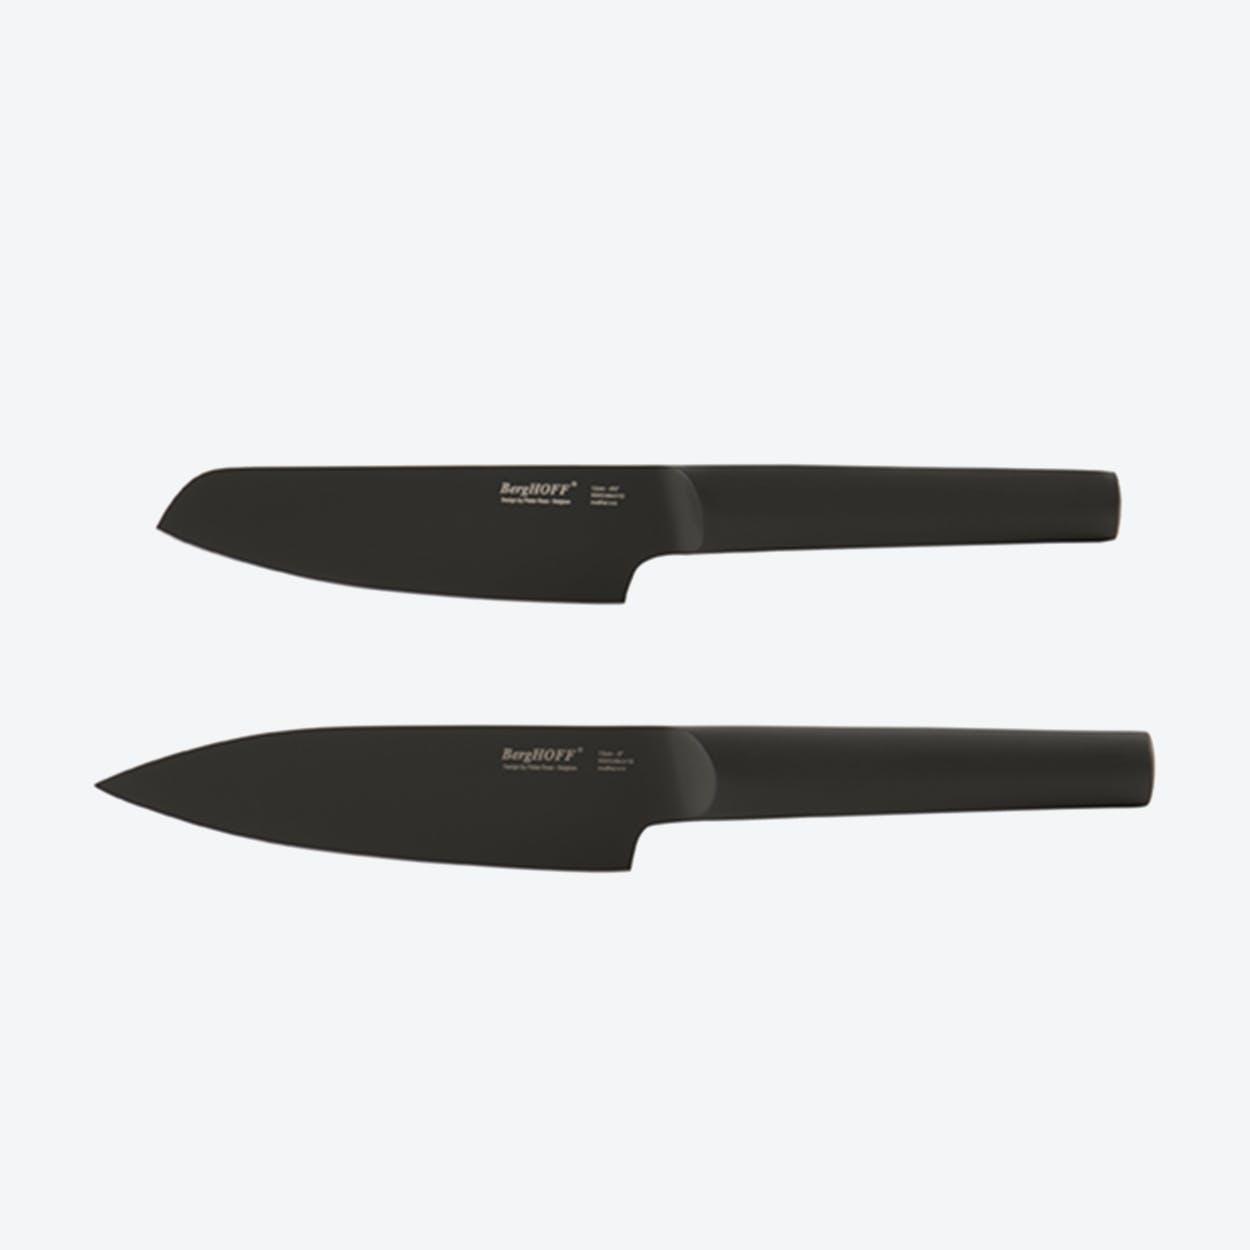 Vegetable & Chef's Knife